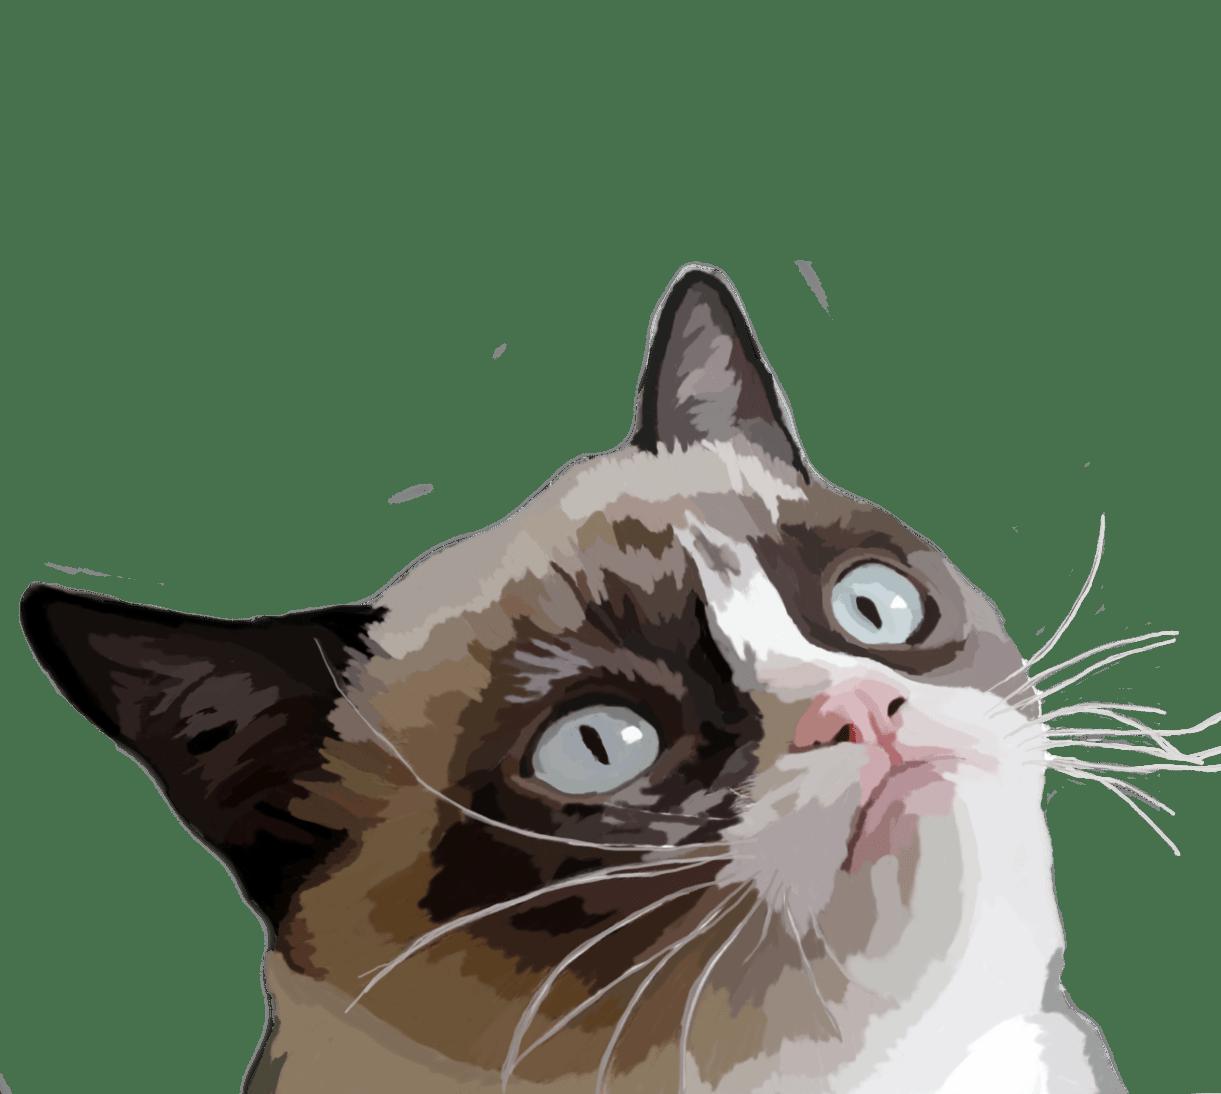 clipart grumpy cat - photo #31